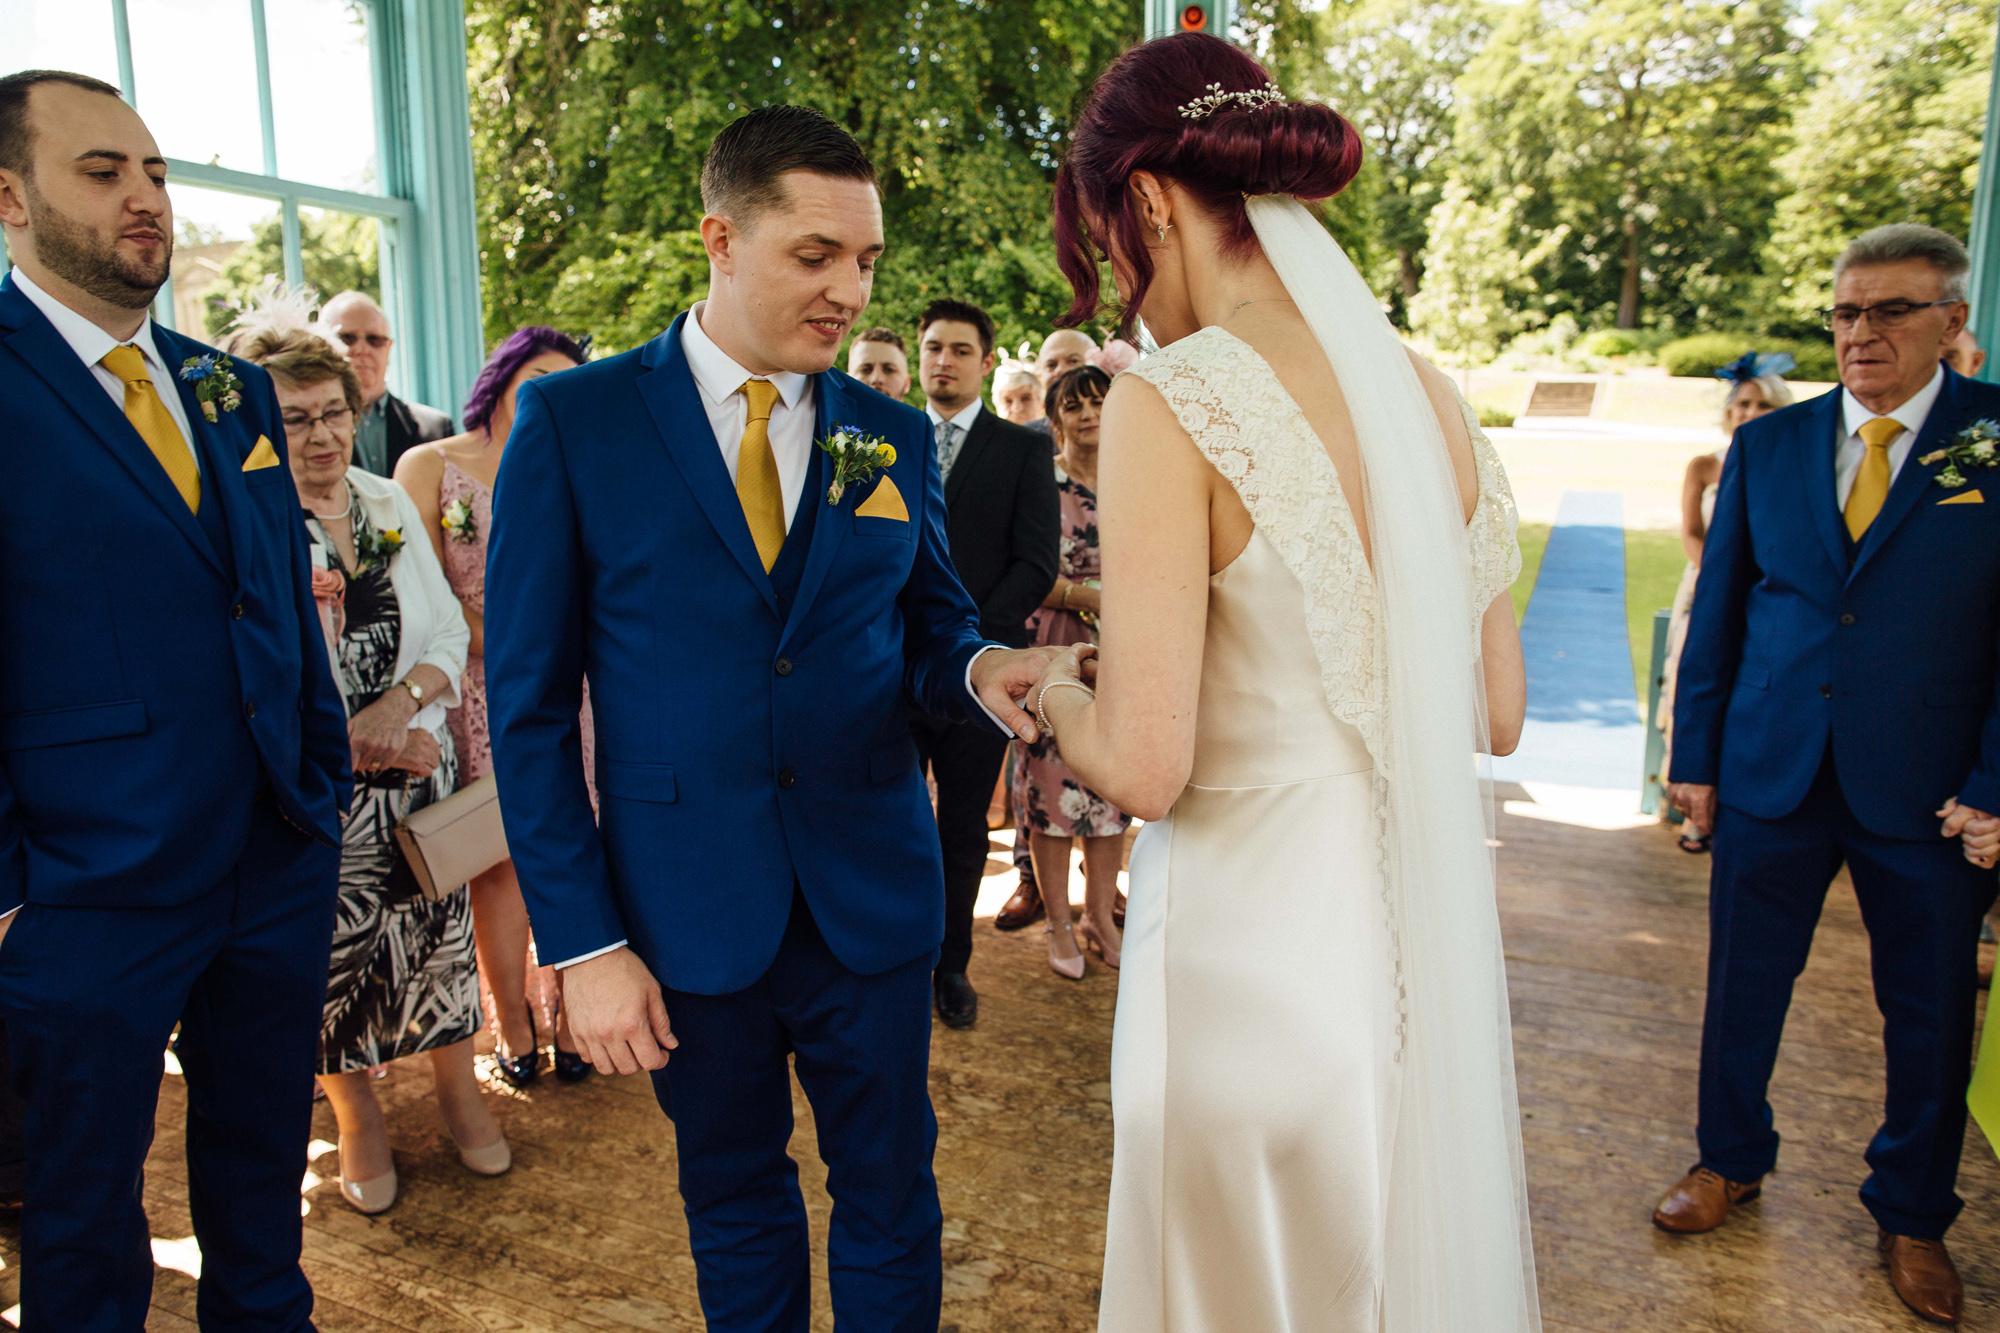 Sarah-Honeysuckle-Bias-Cut-Silk-Vintage-Inspired-Wedding-Gown-Sheffield-Wedding-Kate-Beaumont-19.jpg